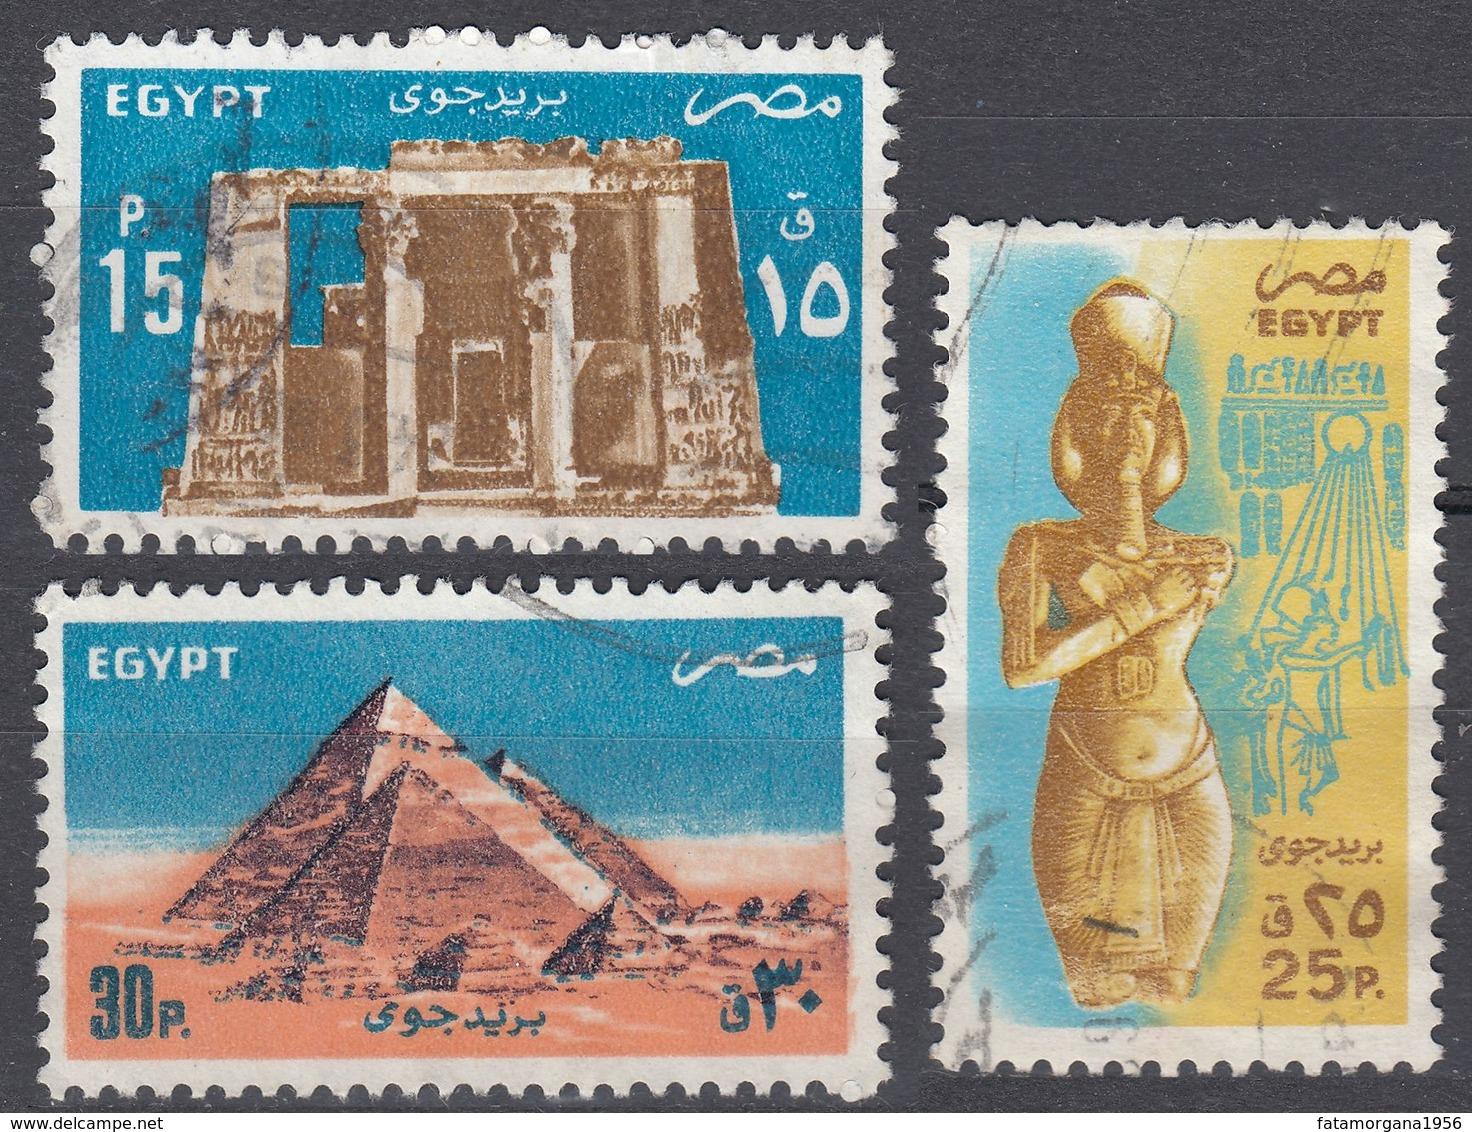 EGITTO - 1985 - Serie Completa Usata: Yvert Posta Aerea 171/173 Per Complessivi 3 Valori. - Posta Aerea